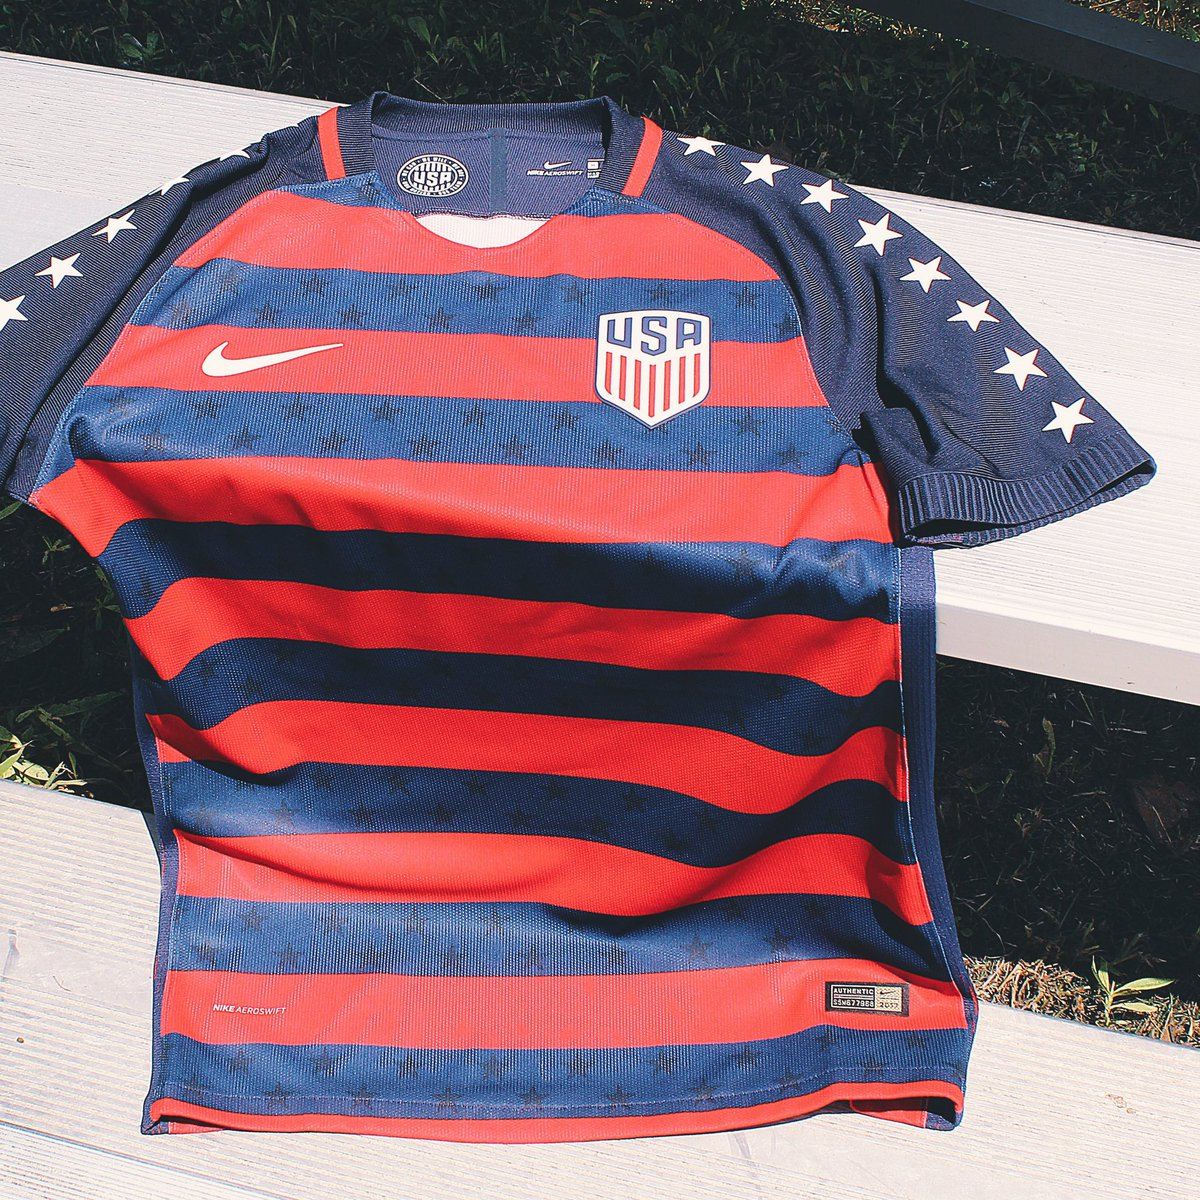 on sale 537d0 57316 new-usmnt-jersey